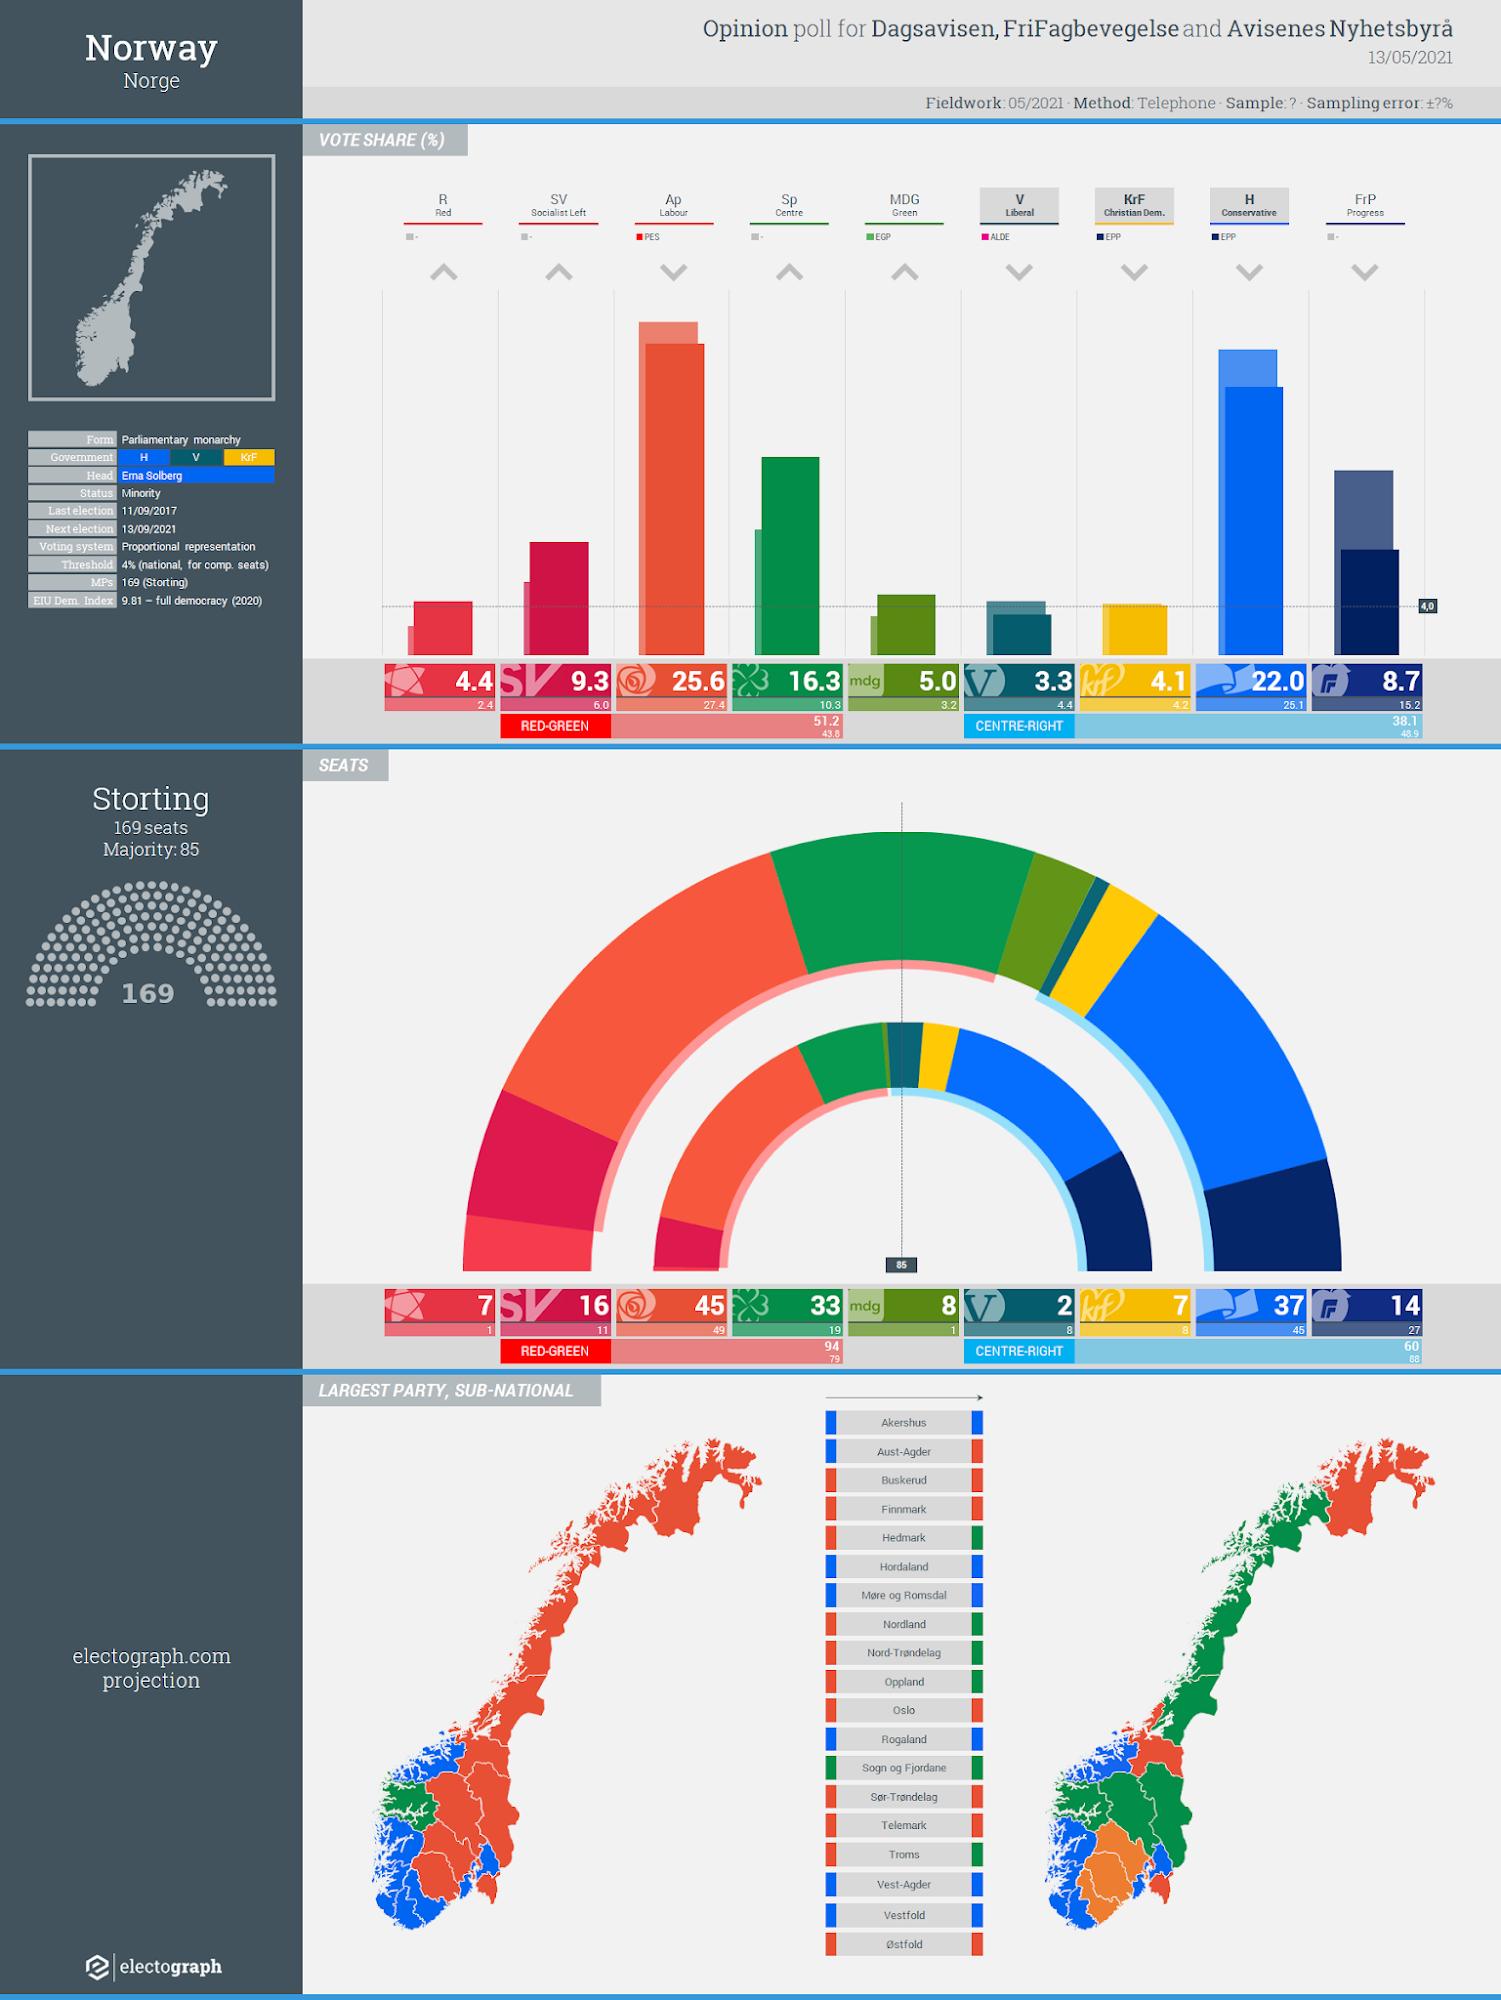 NORWAY: Opinion poll chart for FriFagbevegelse, Dagsavisen and Avisenes Nyhetsbyrå, 13 May 2021